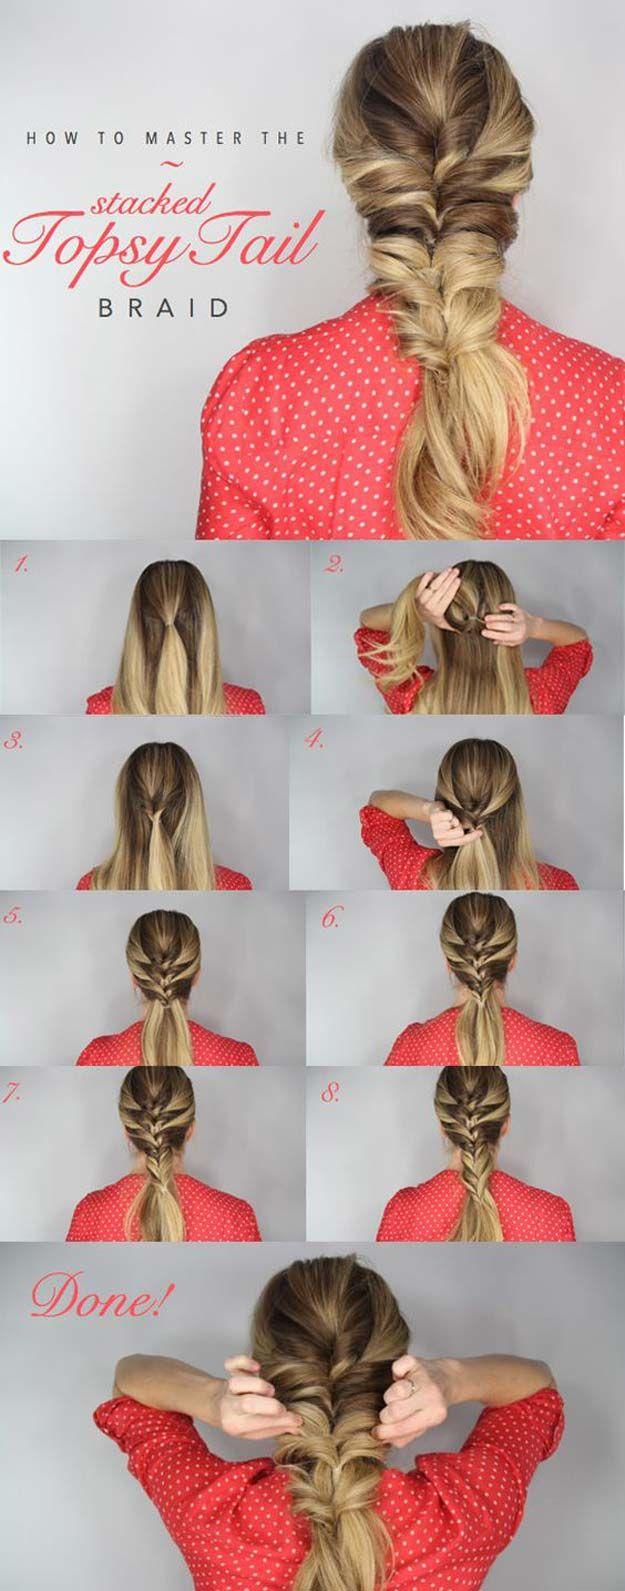 Best Hair Braiding Tutorials - Topsy Tail Braid - Easy Step by Step Tutorials fo...